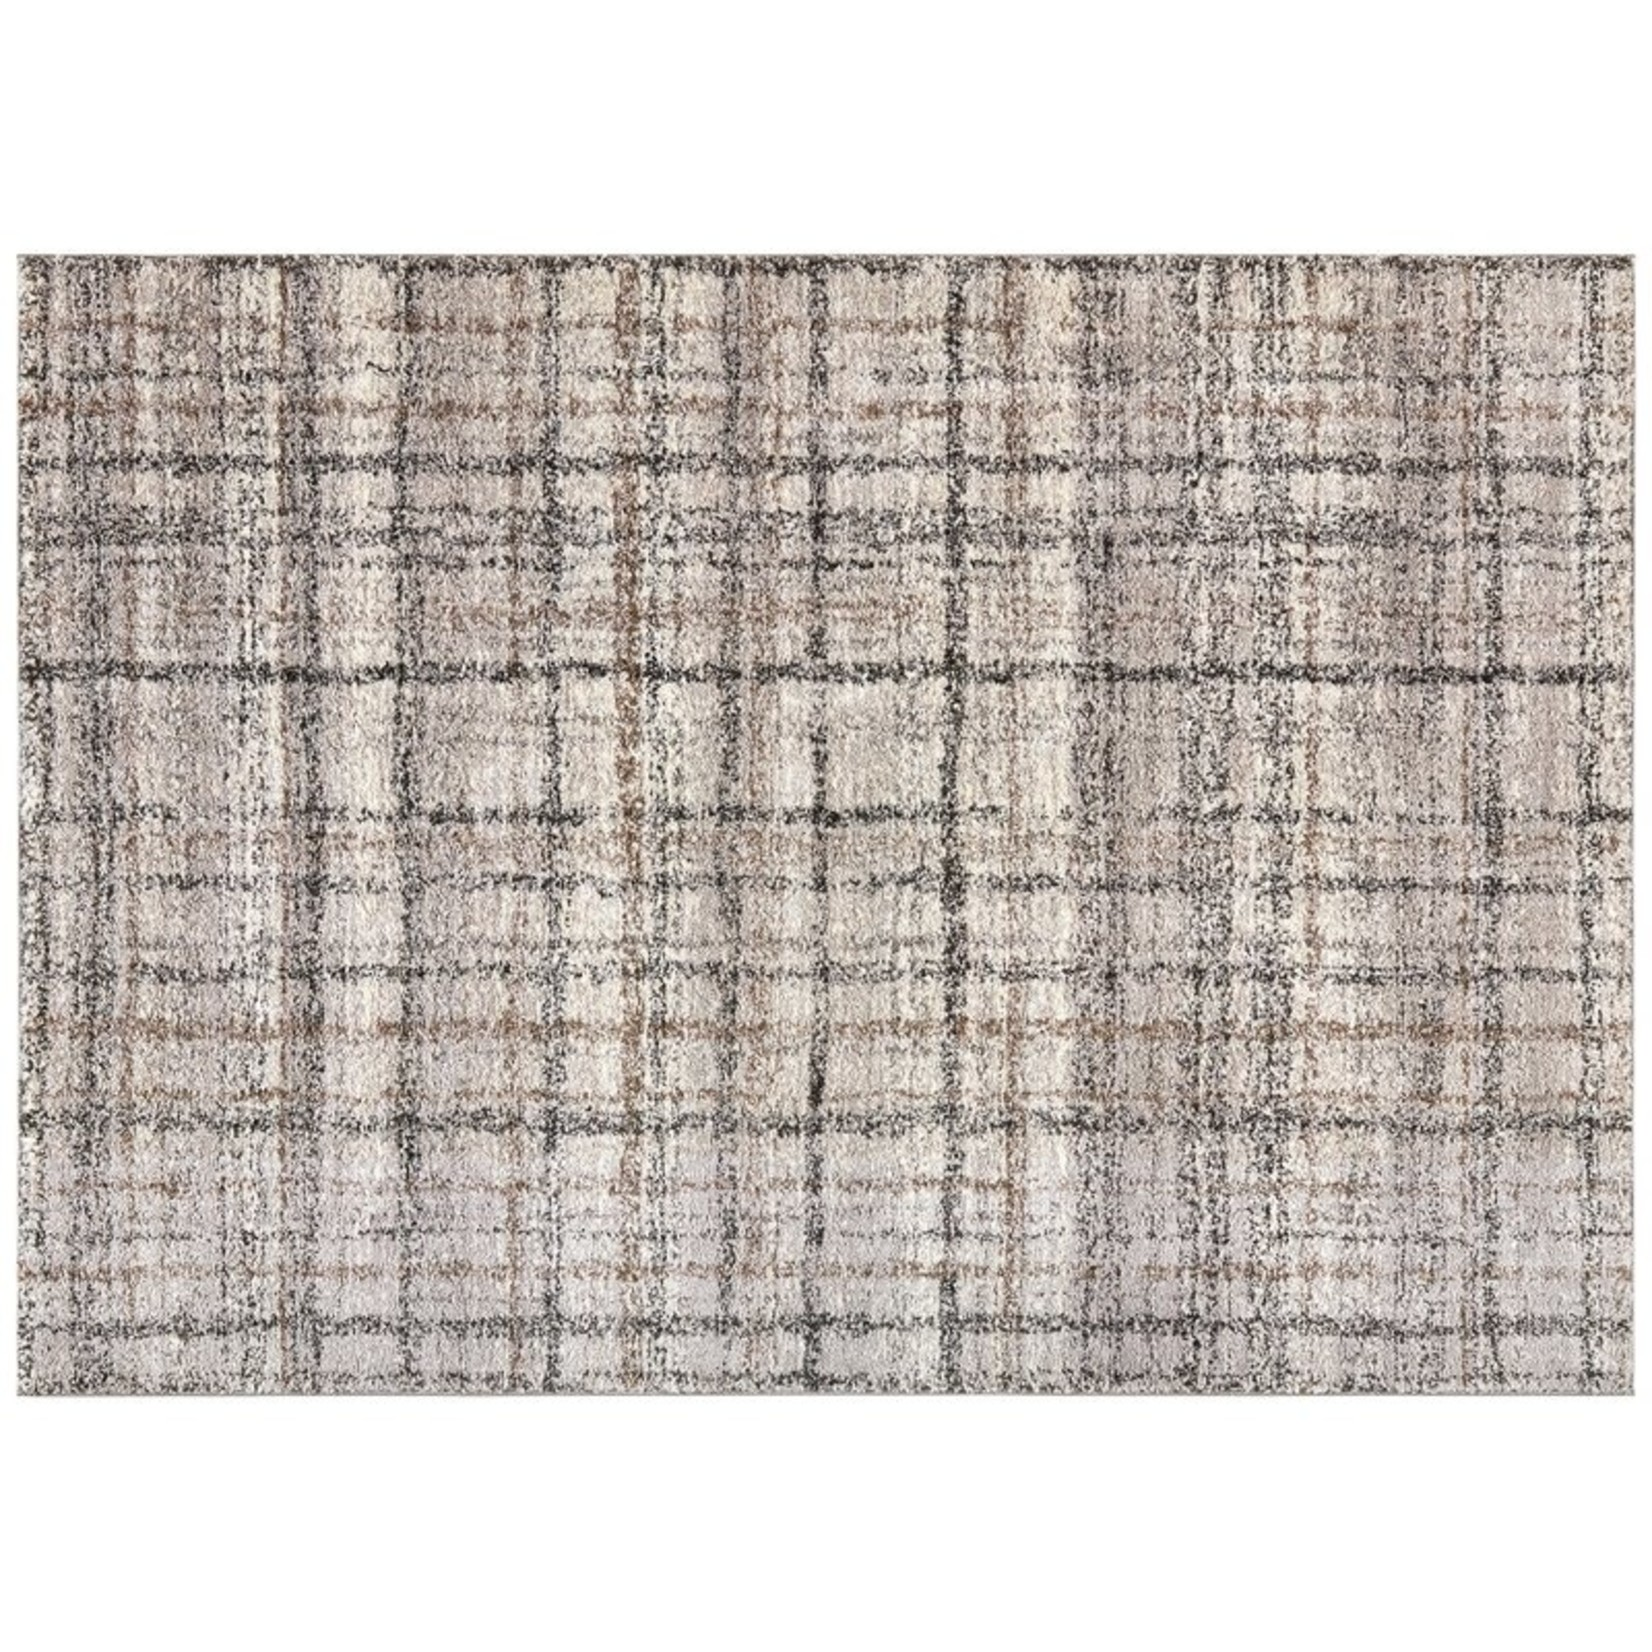 *6'6 x 9'6 - Parkridge Stricker Soot Gray Area Rug